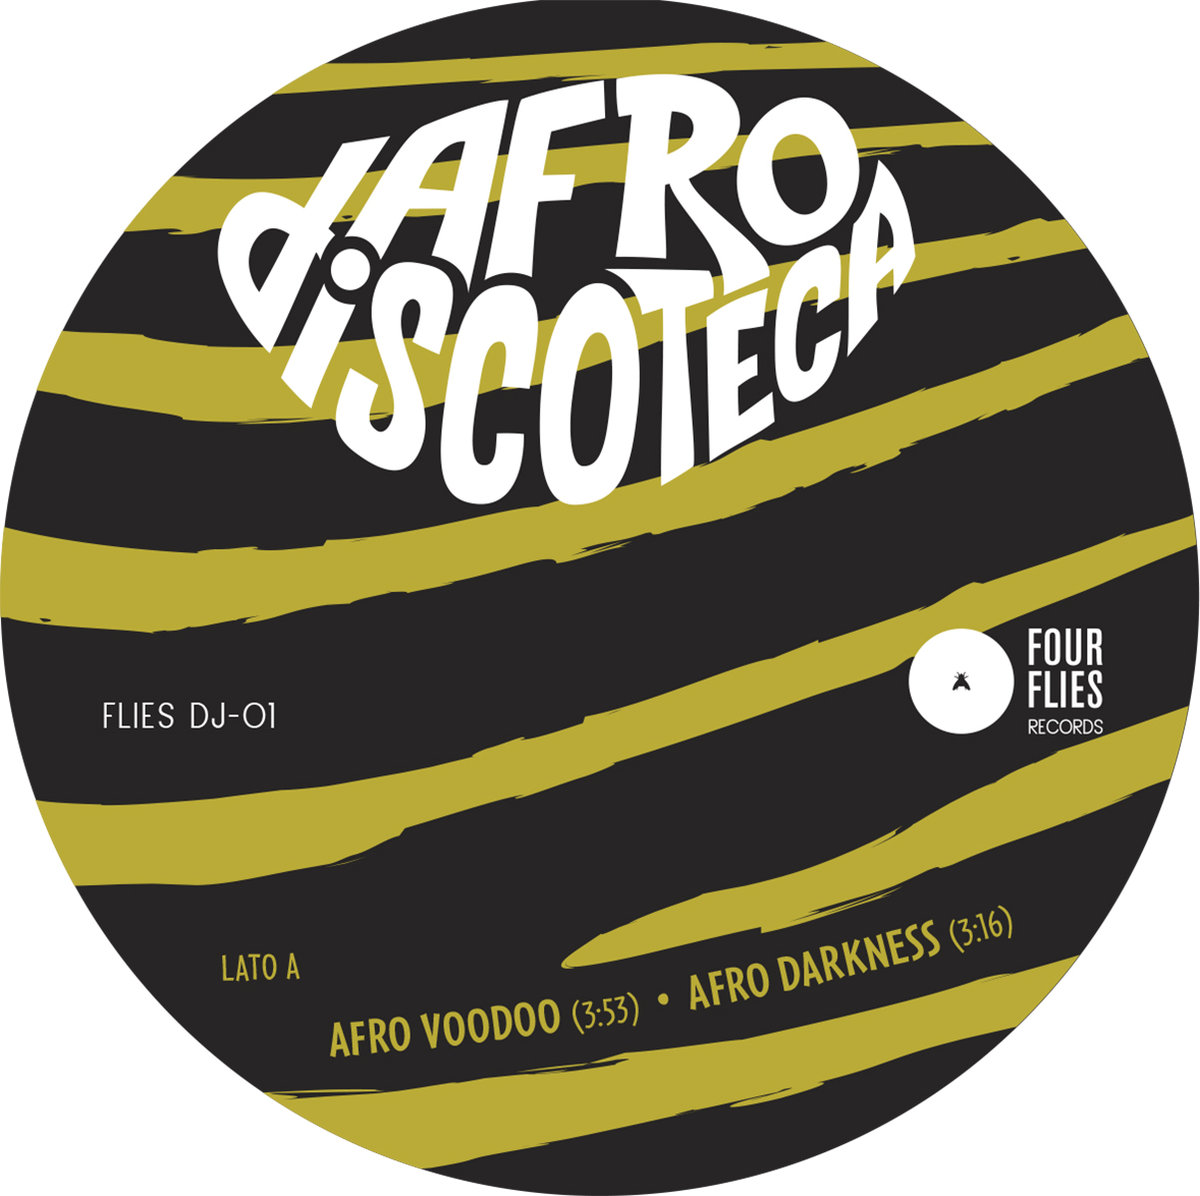 afro discoteca label 1 four flies